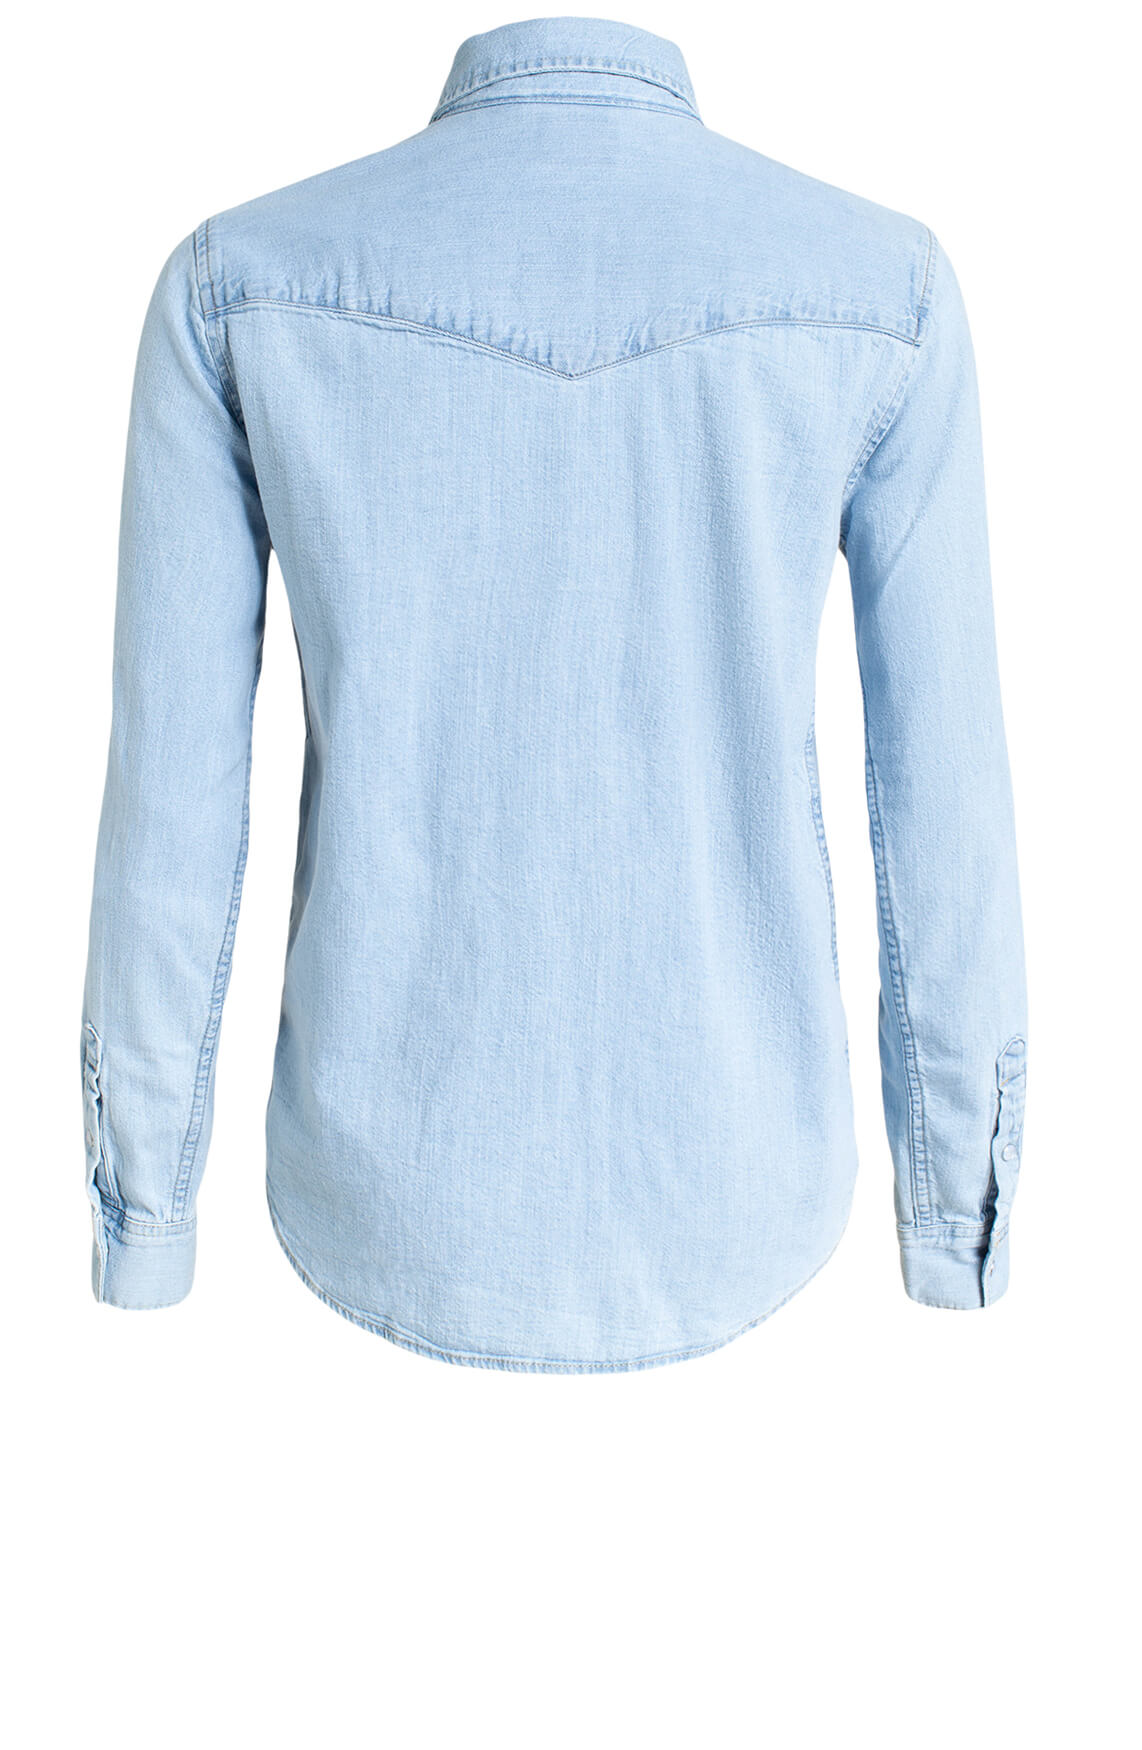 Levi s Dames Spijkerblouse Blauw